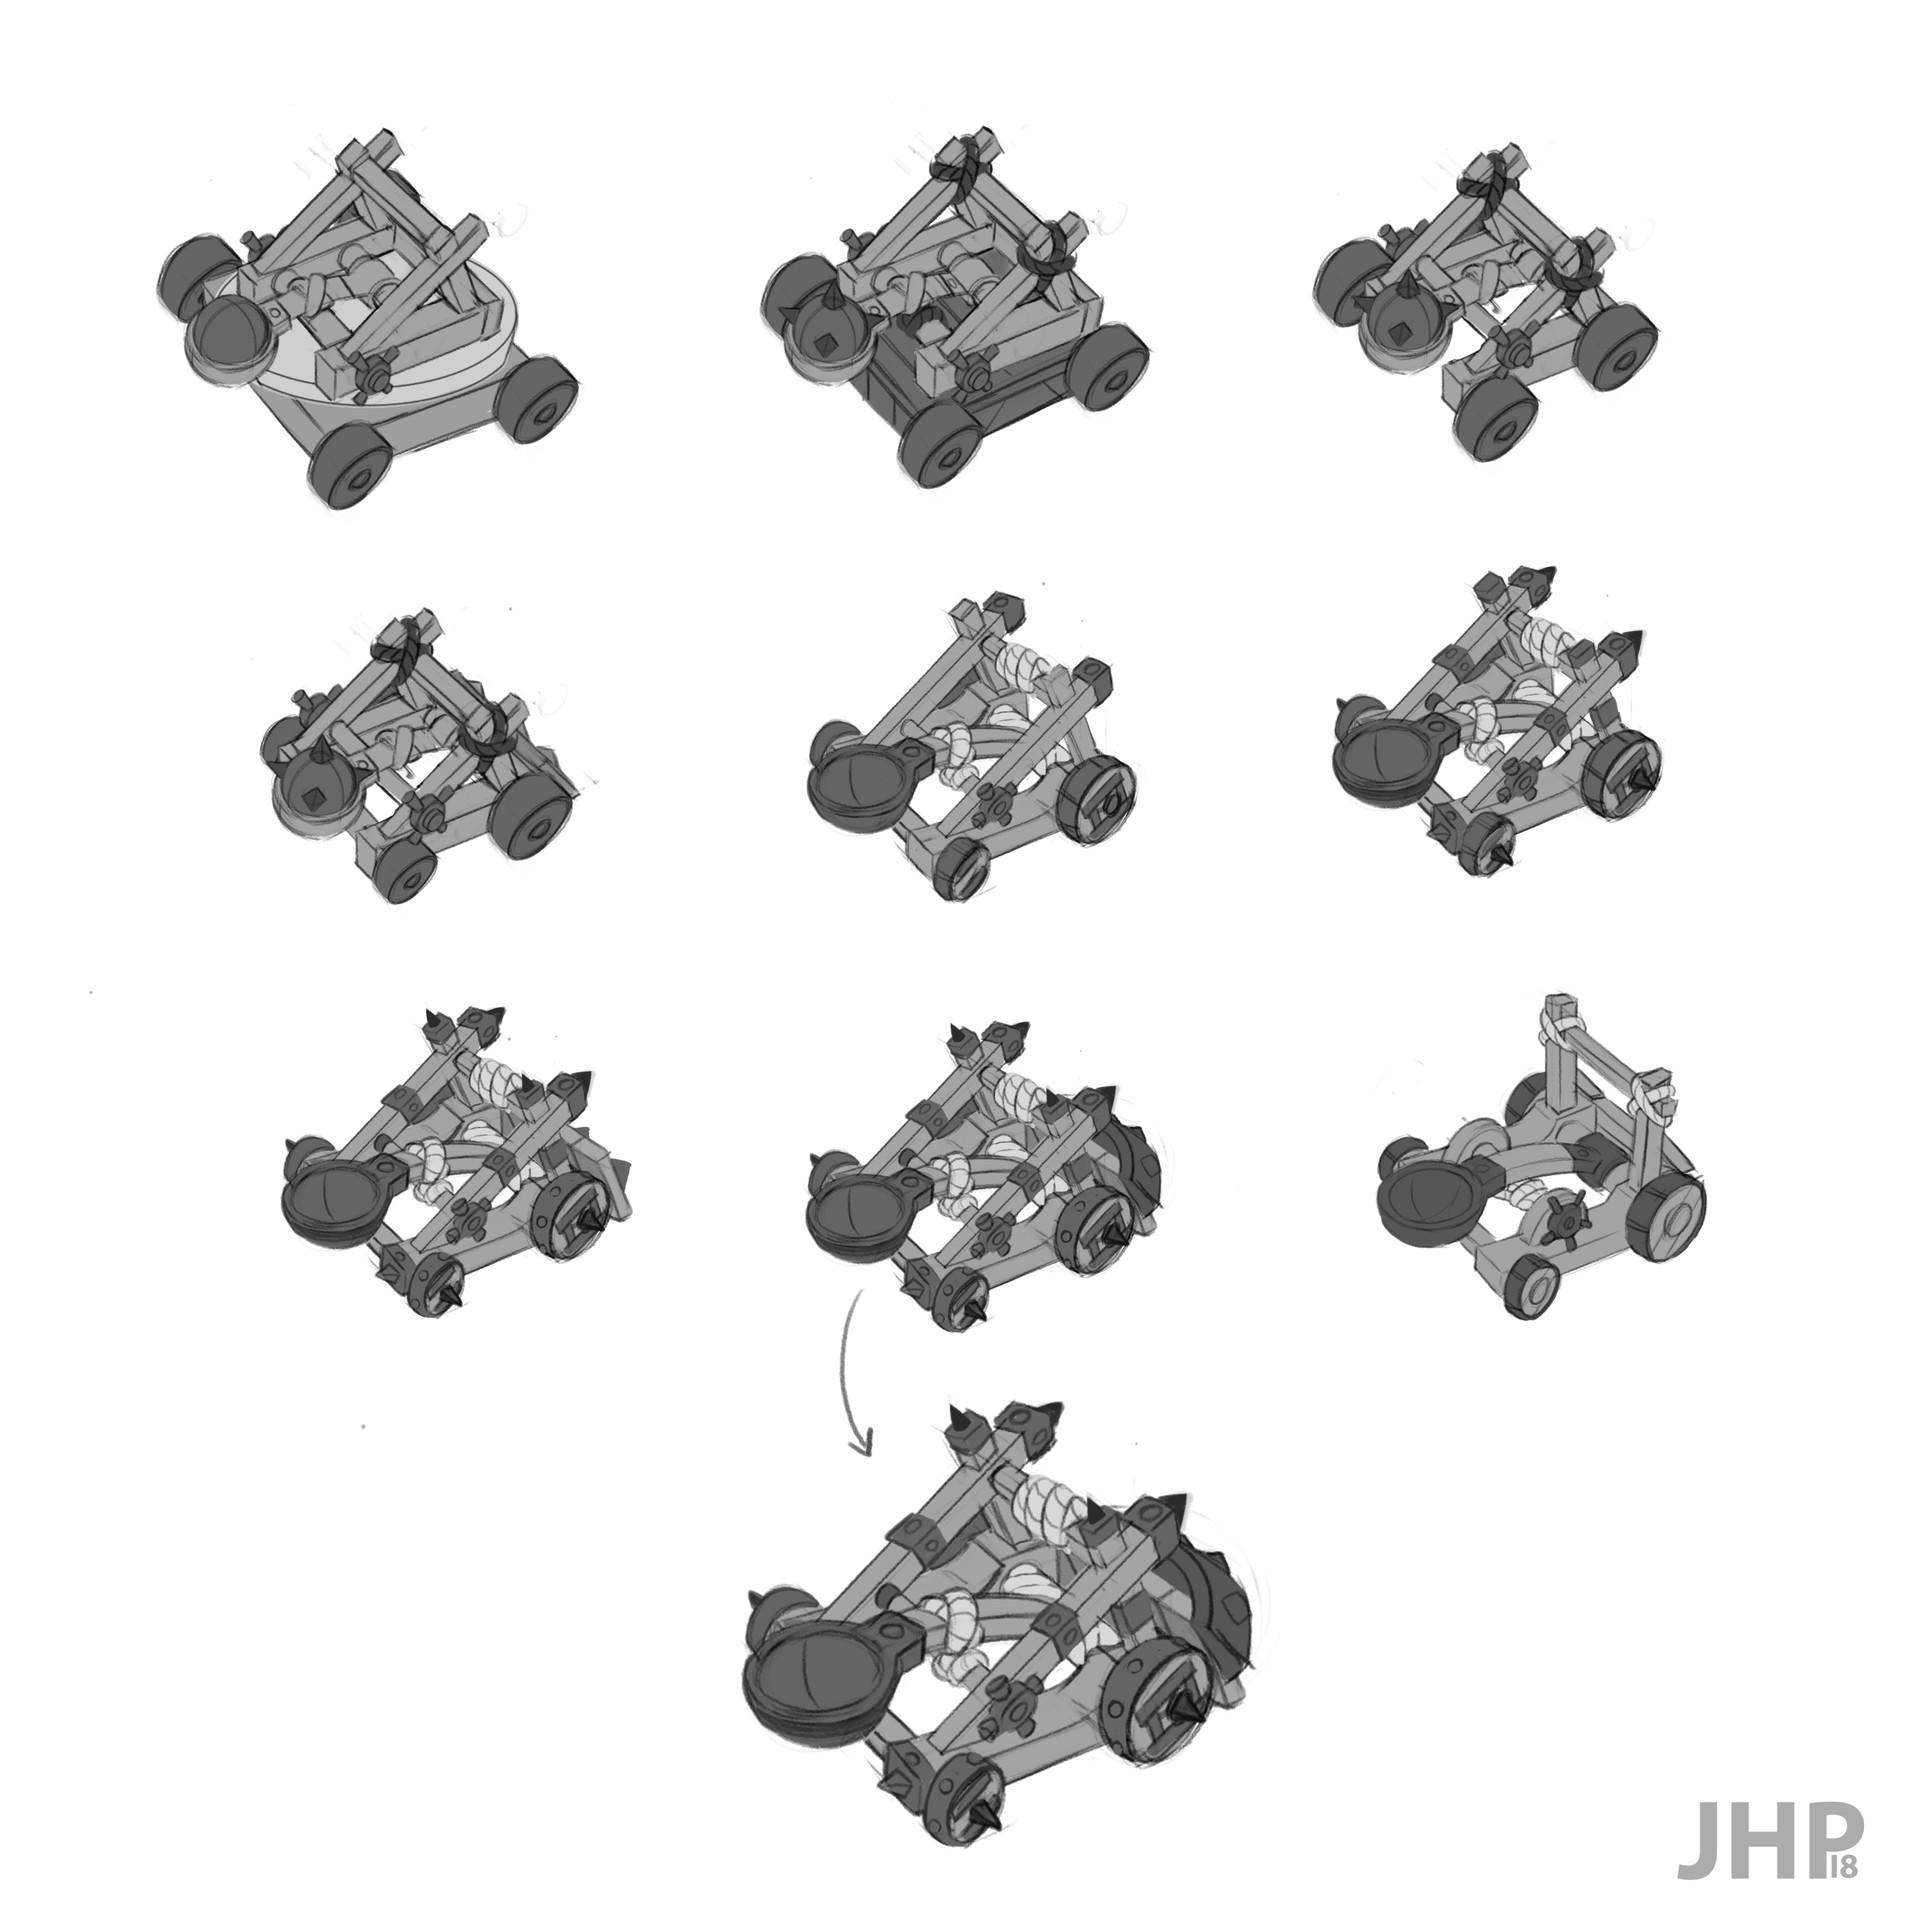 Joao henrique pacheco catapult concept p postar